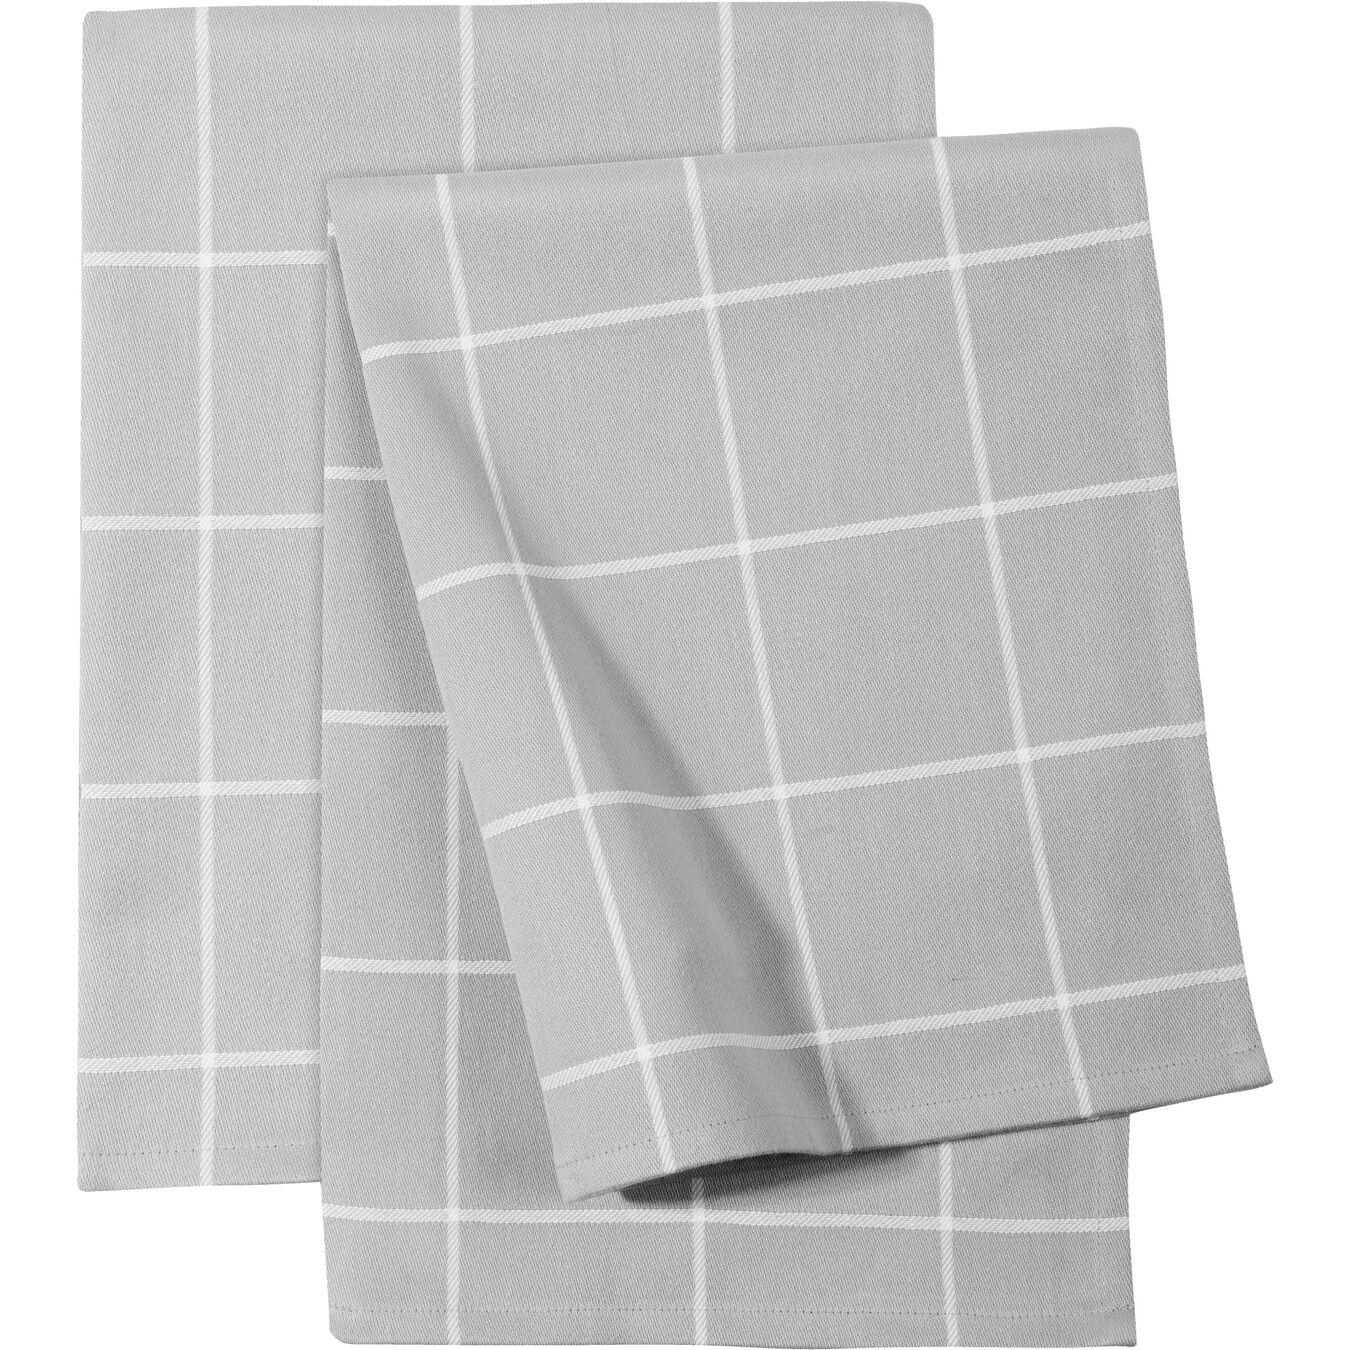 Küchenhandtuch Set kariert, 2-tlg | Grau,,large 1